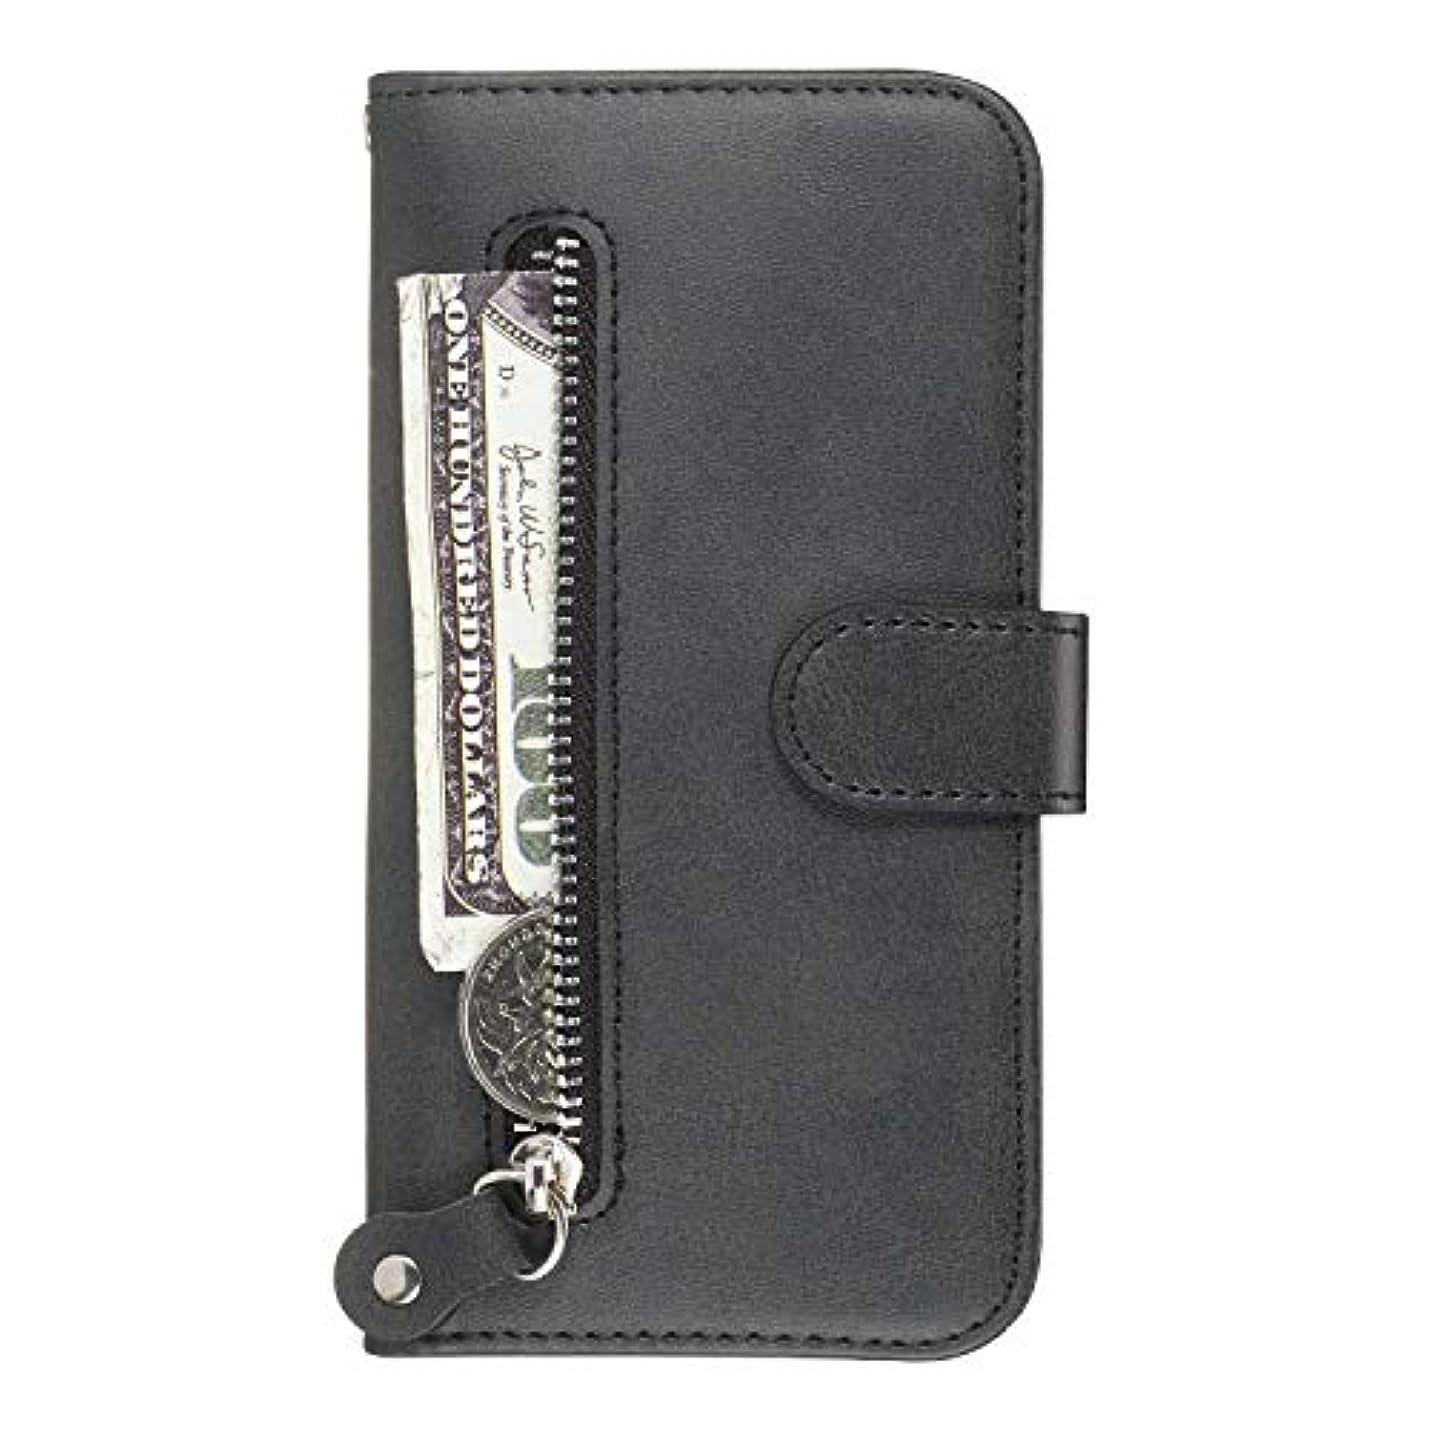 OMATENTI iPhone X/iPhone XS ケース, 軽量 PUレザー 薄型 簡約風 人気カバー バックケース iPhone X/iPhone XS 用 Case Cover, 液晶保護 カード収納, 財布と...